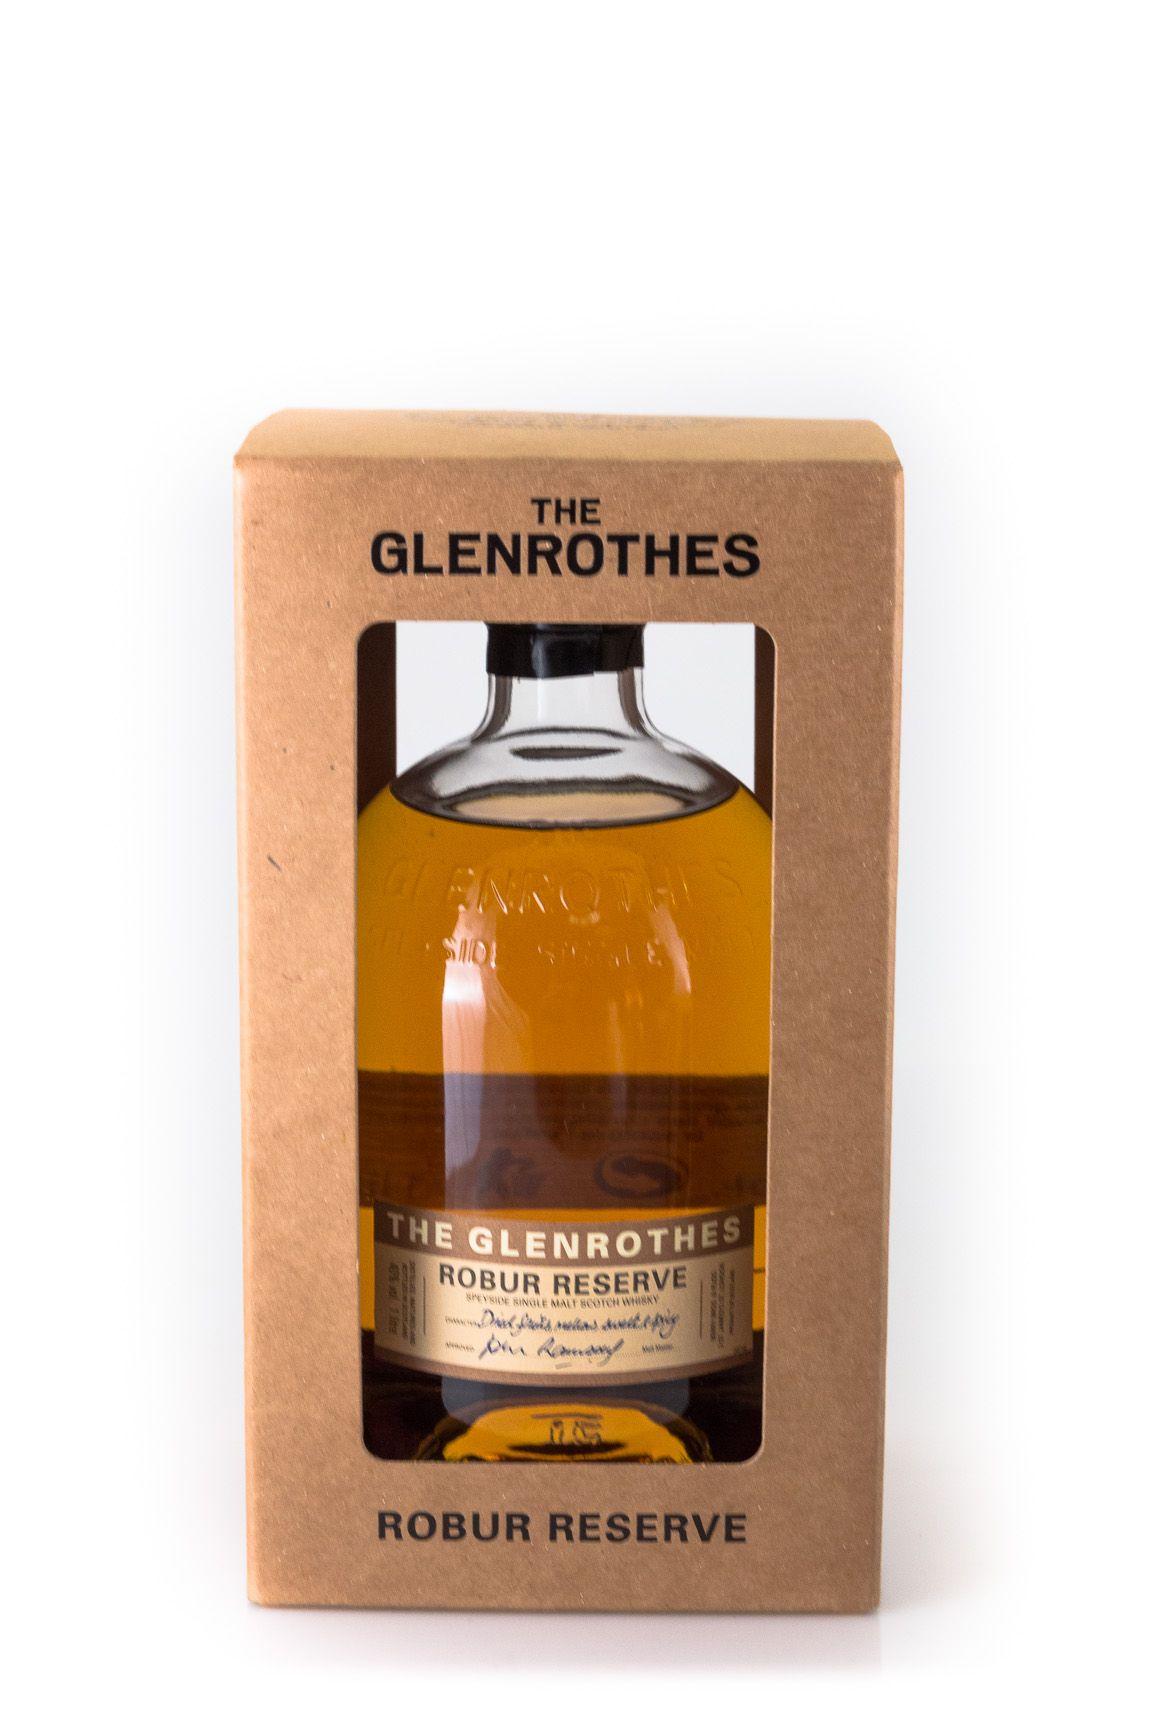 Name: The Glenrothes Robur Réserve Speyside Single Malt Scotch ...